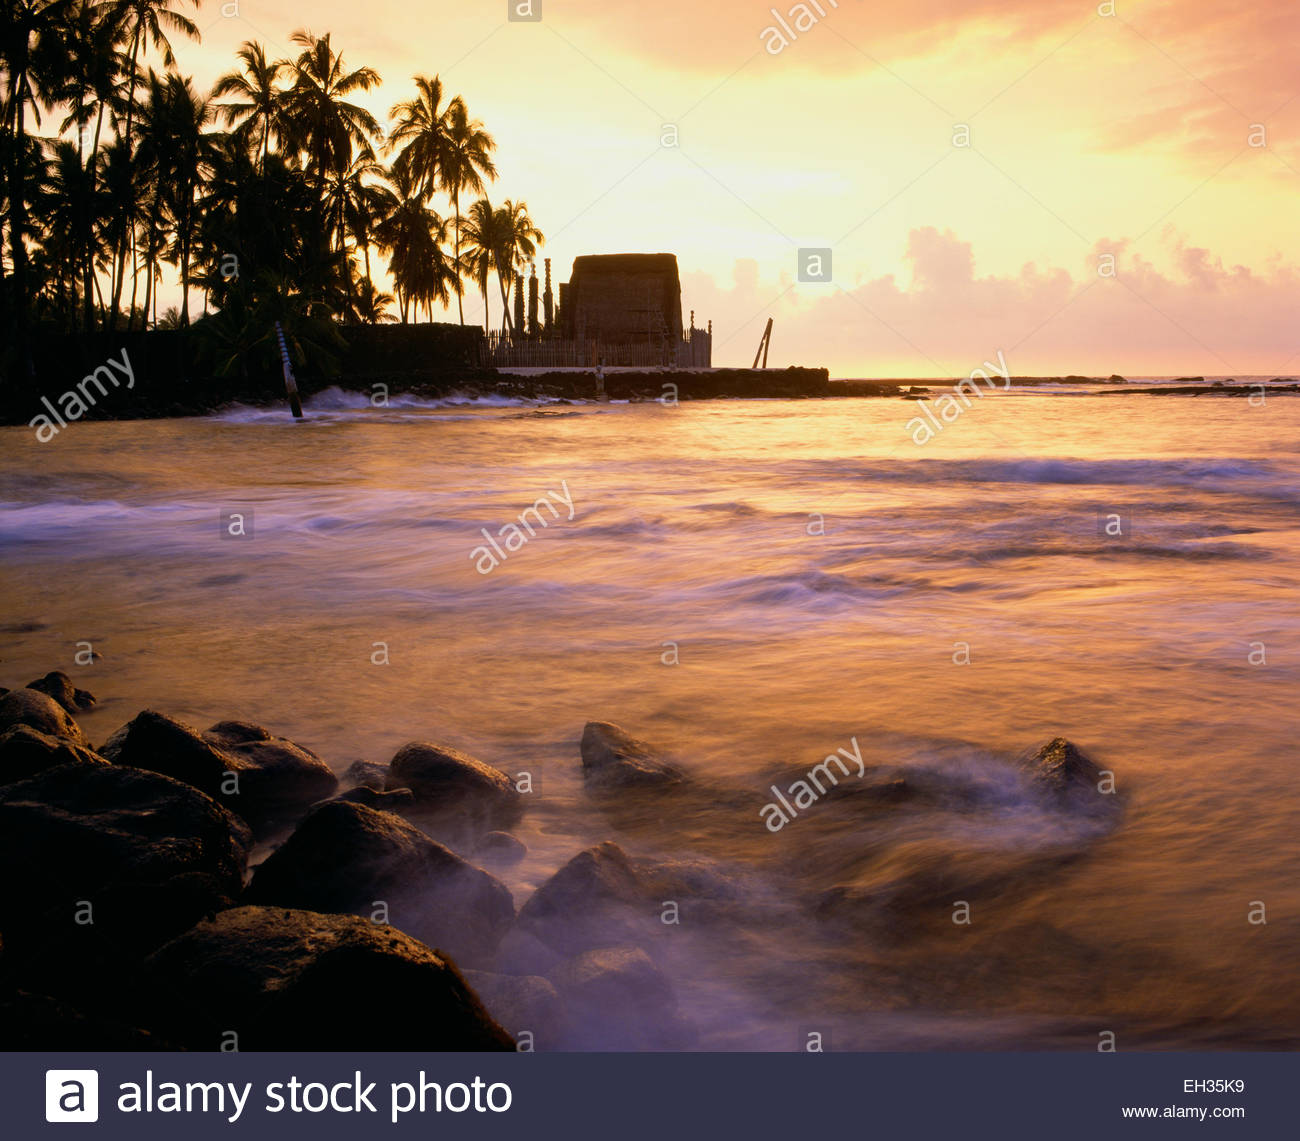 Pu'uhonua o Honaunau National Historic Site. Heiau, La Isla Grande de Hawai. Foto de stock